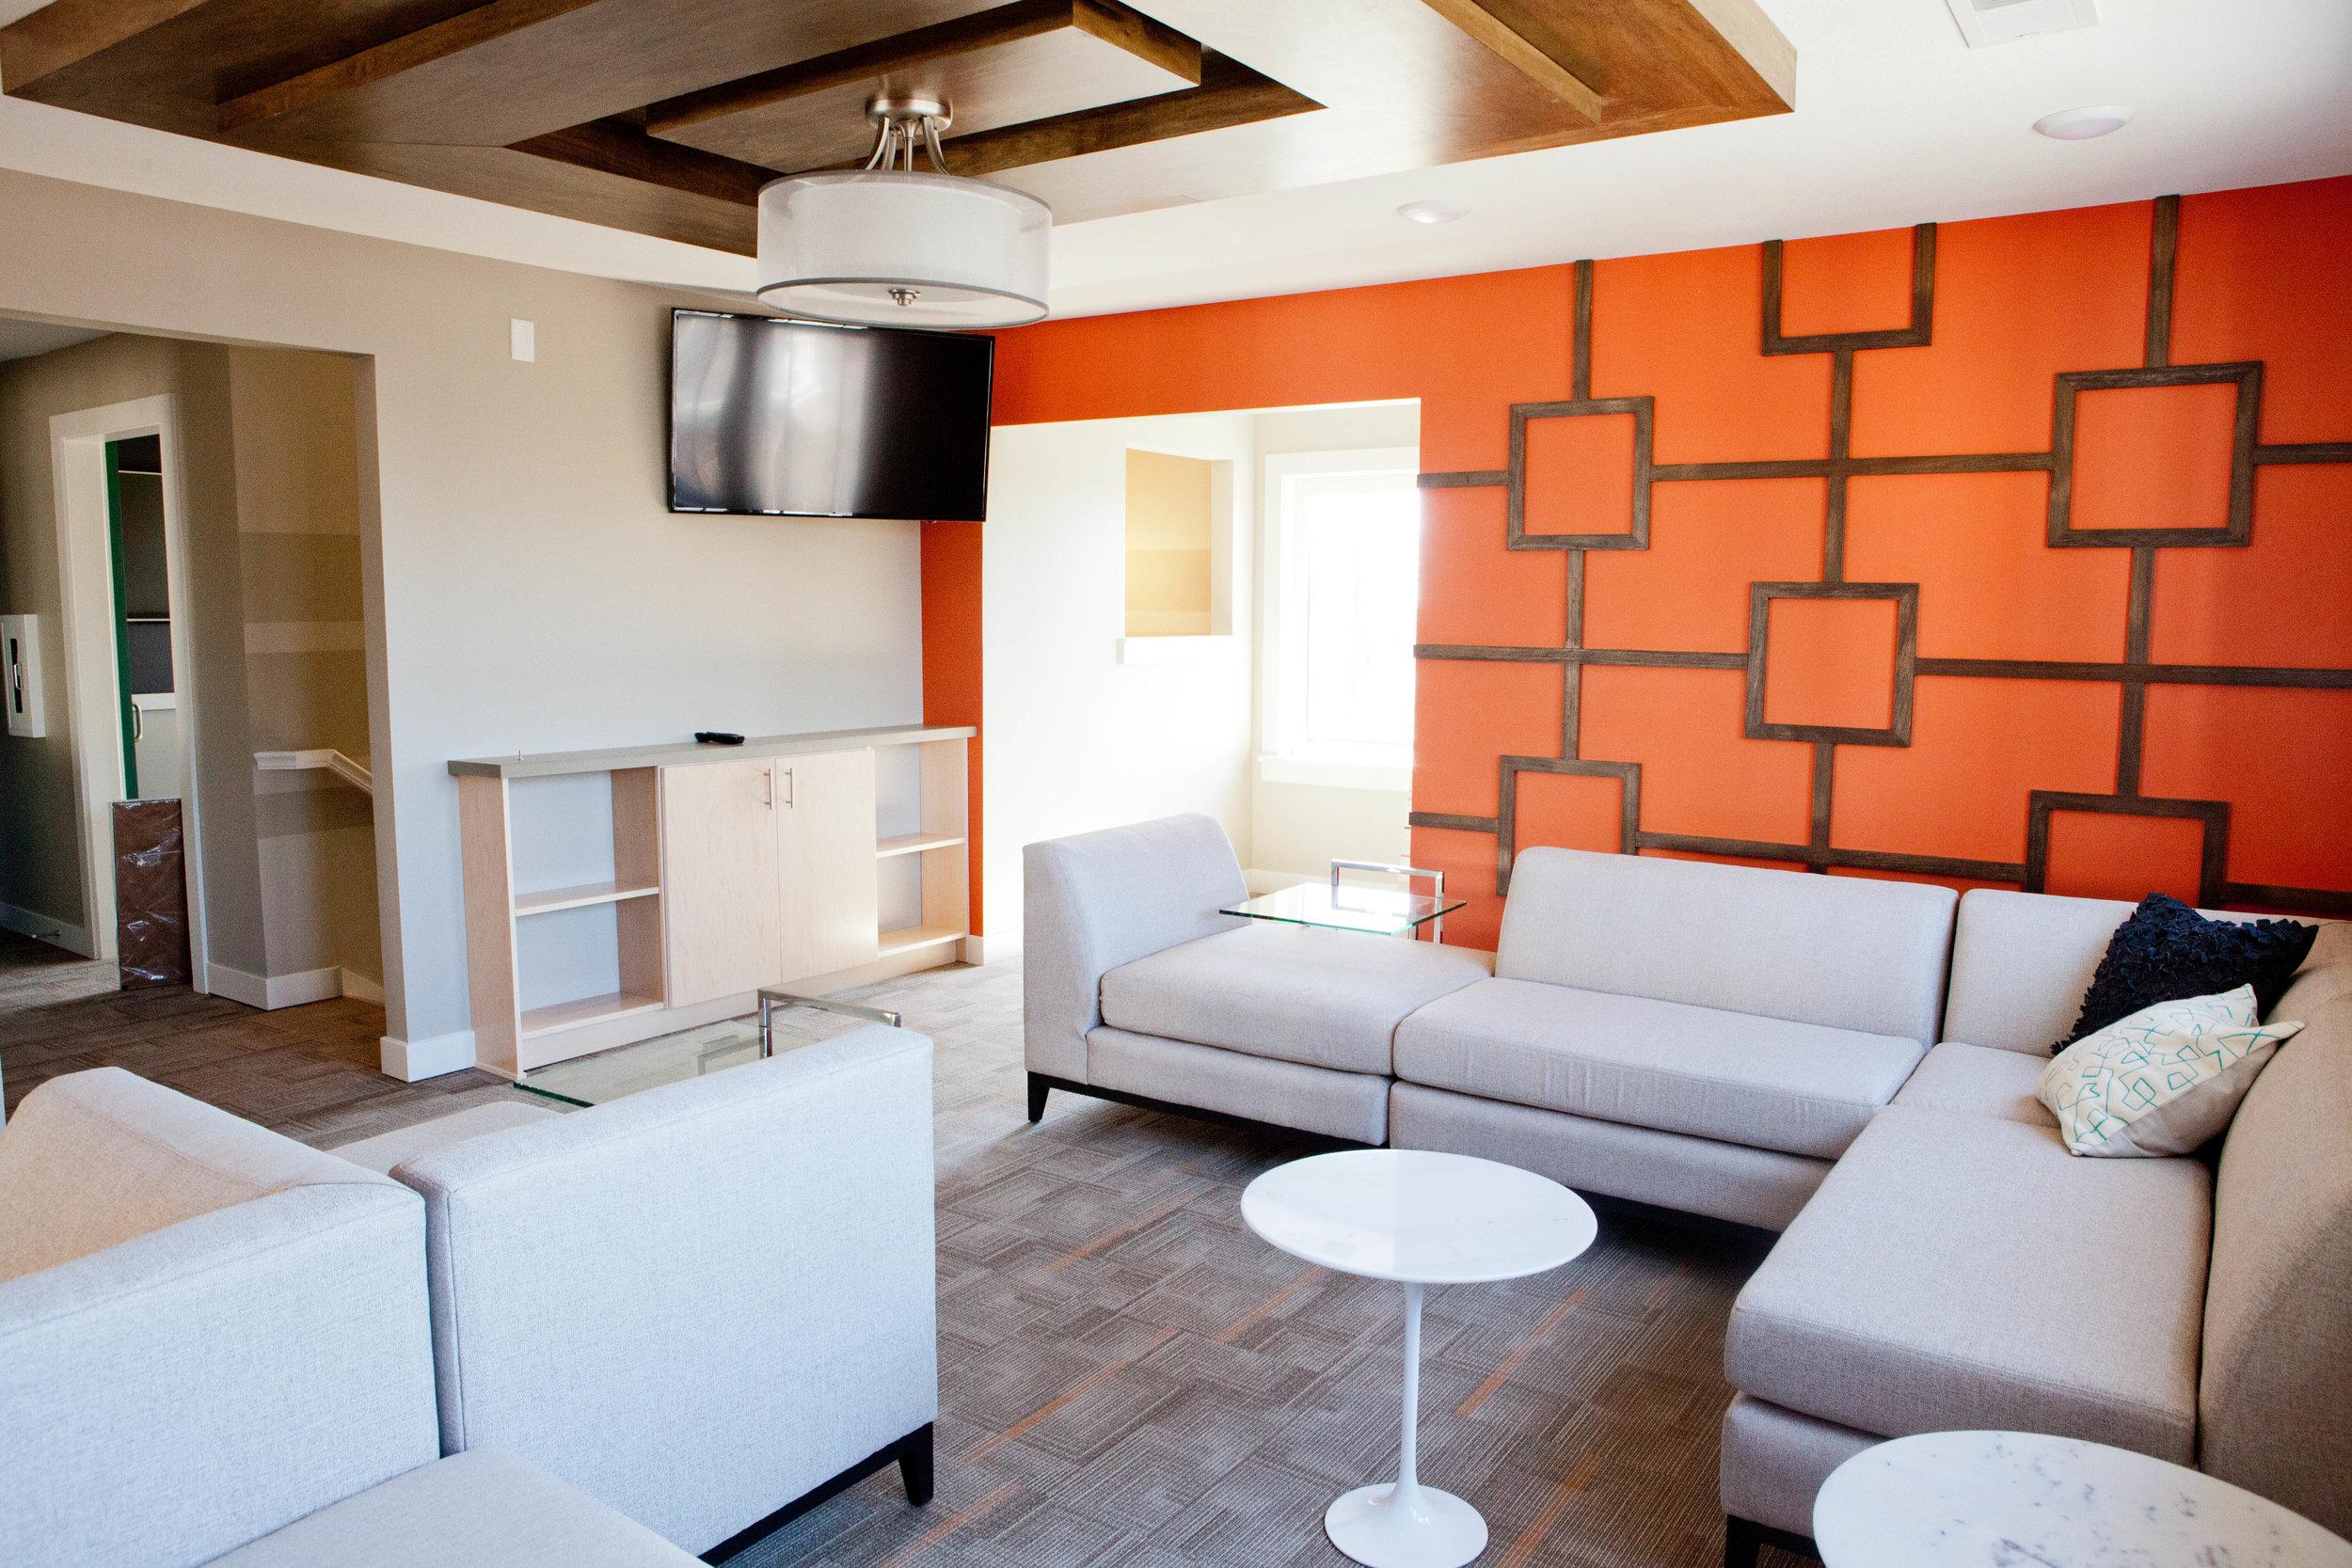 City Flats on Walnut longue - cafe 2 (amenities).JPG